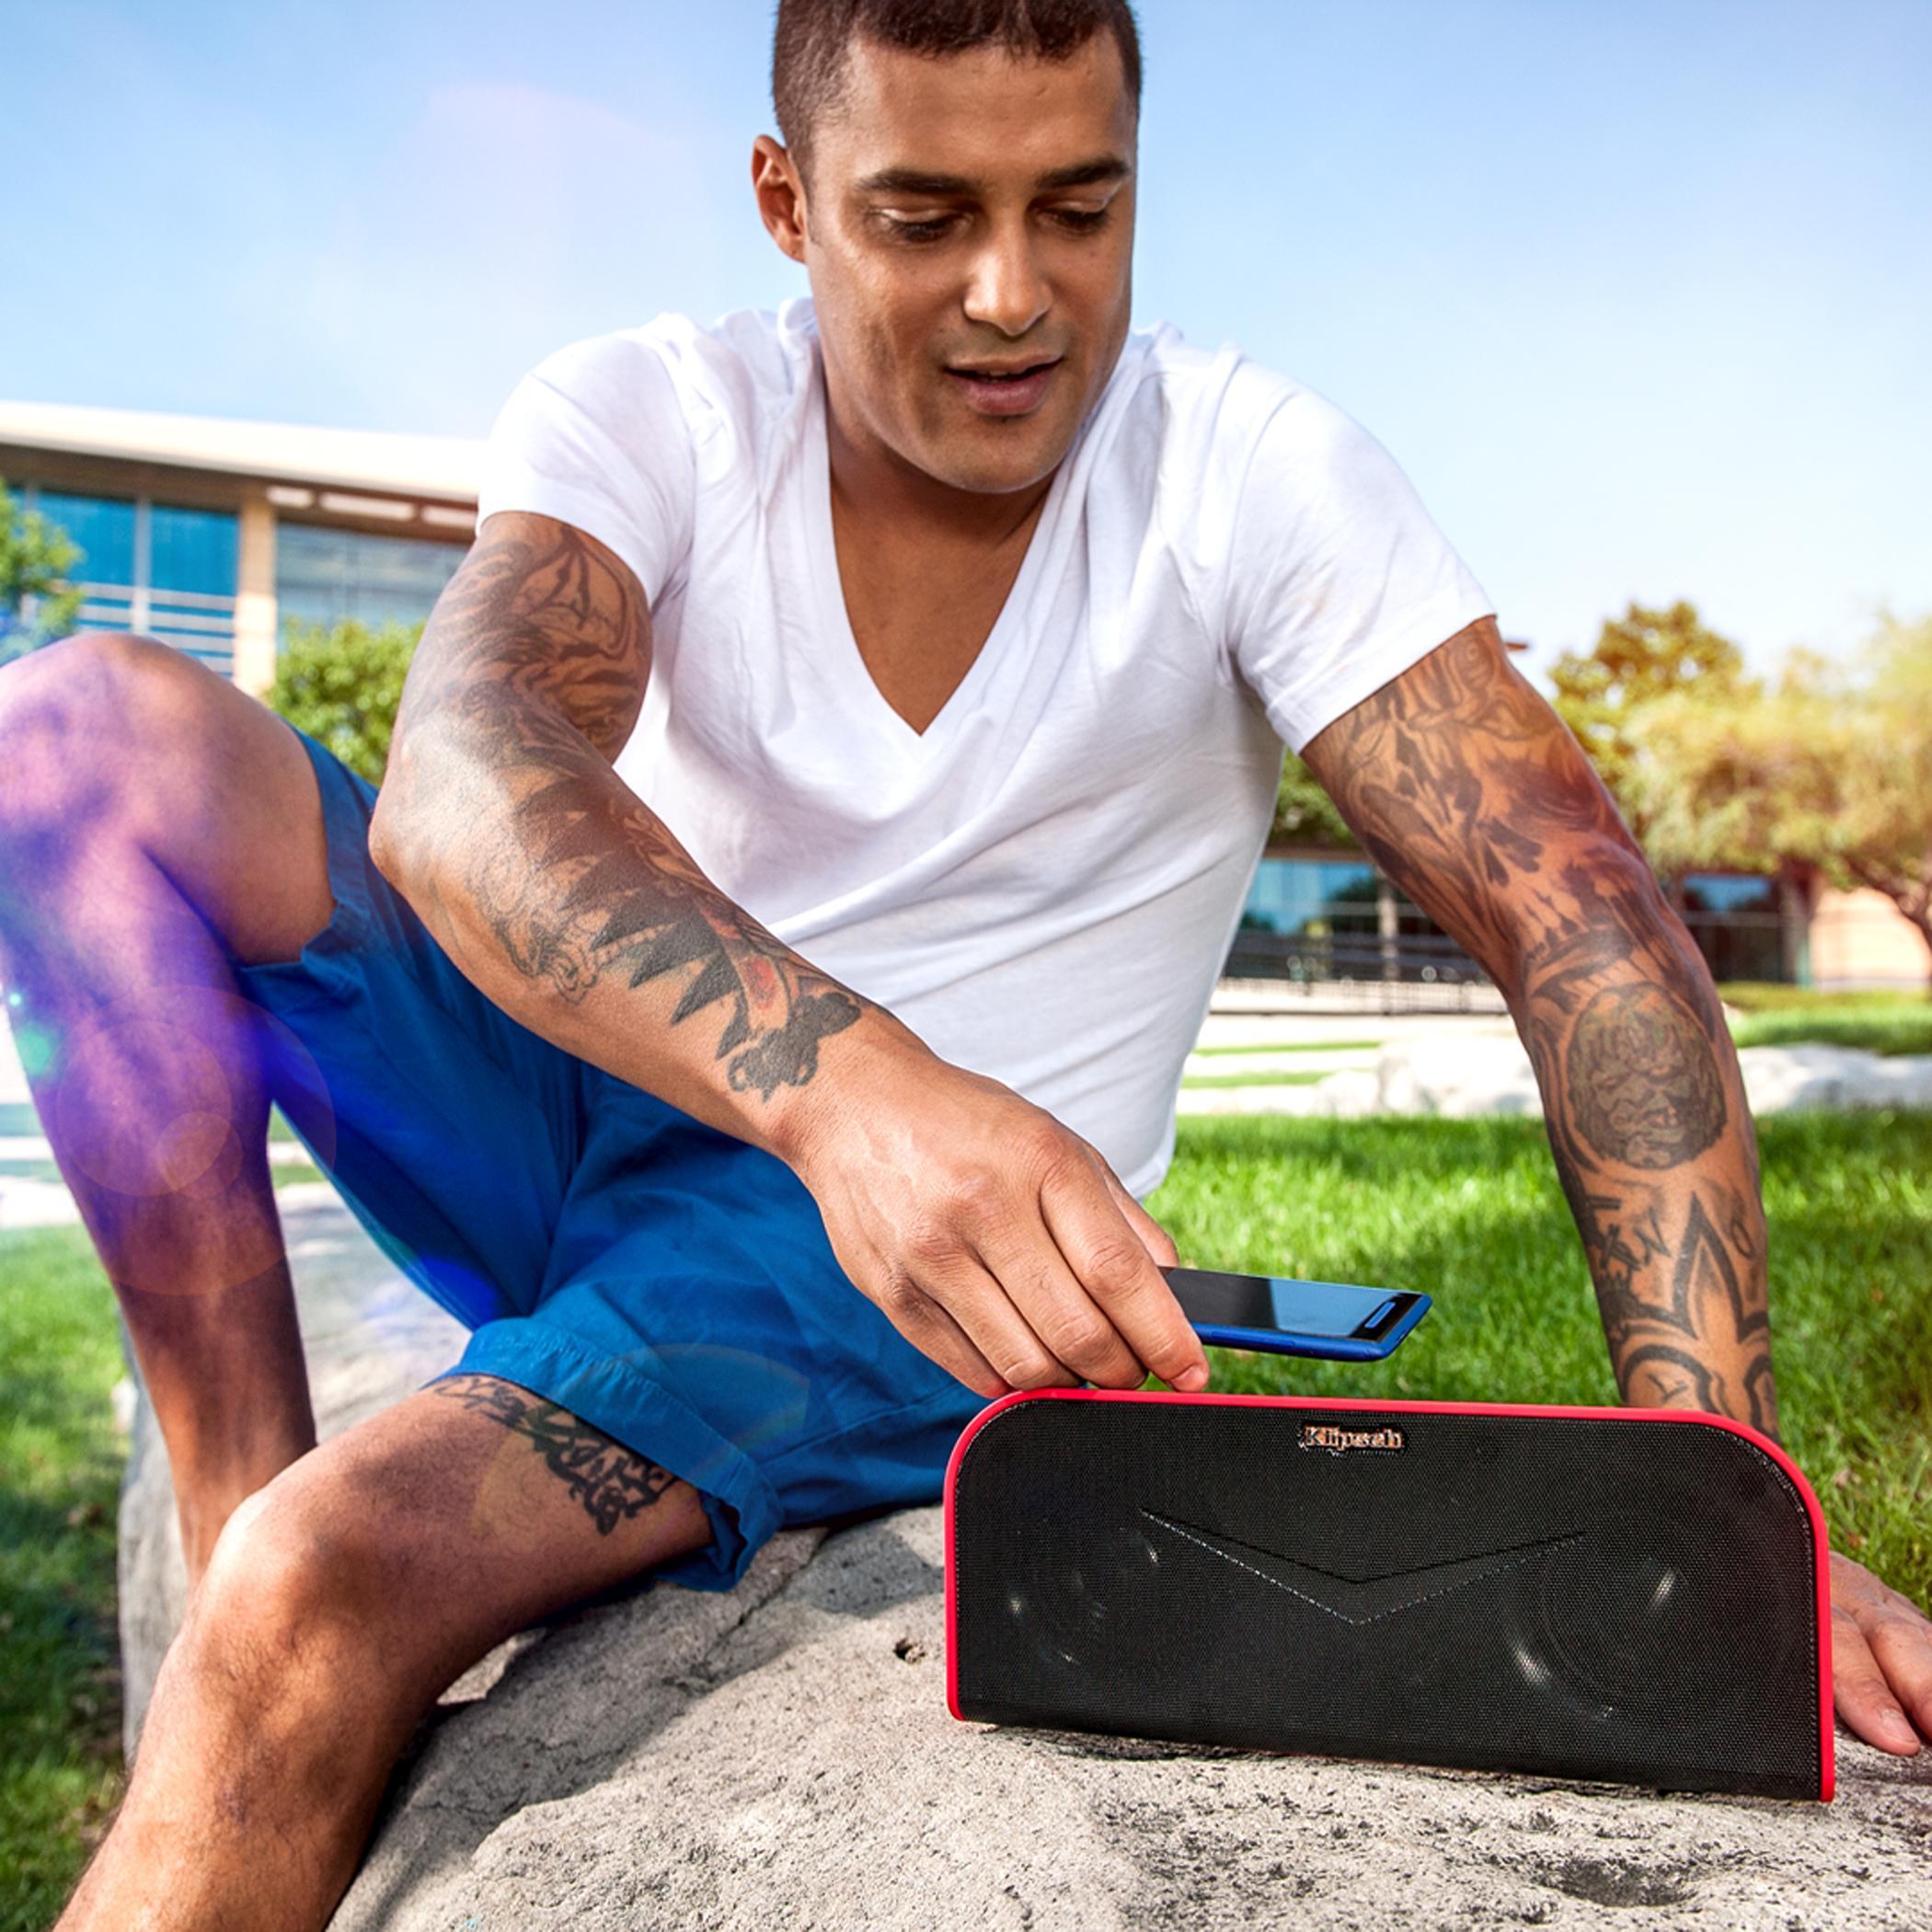 Amazon.com: Klipsch KMC 1 Black Portable Speaker with